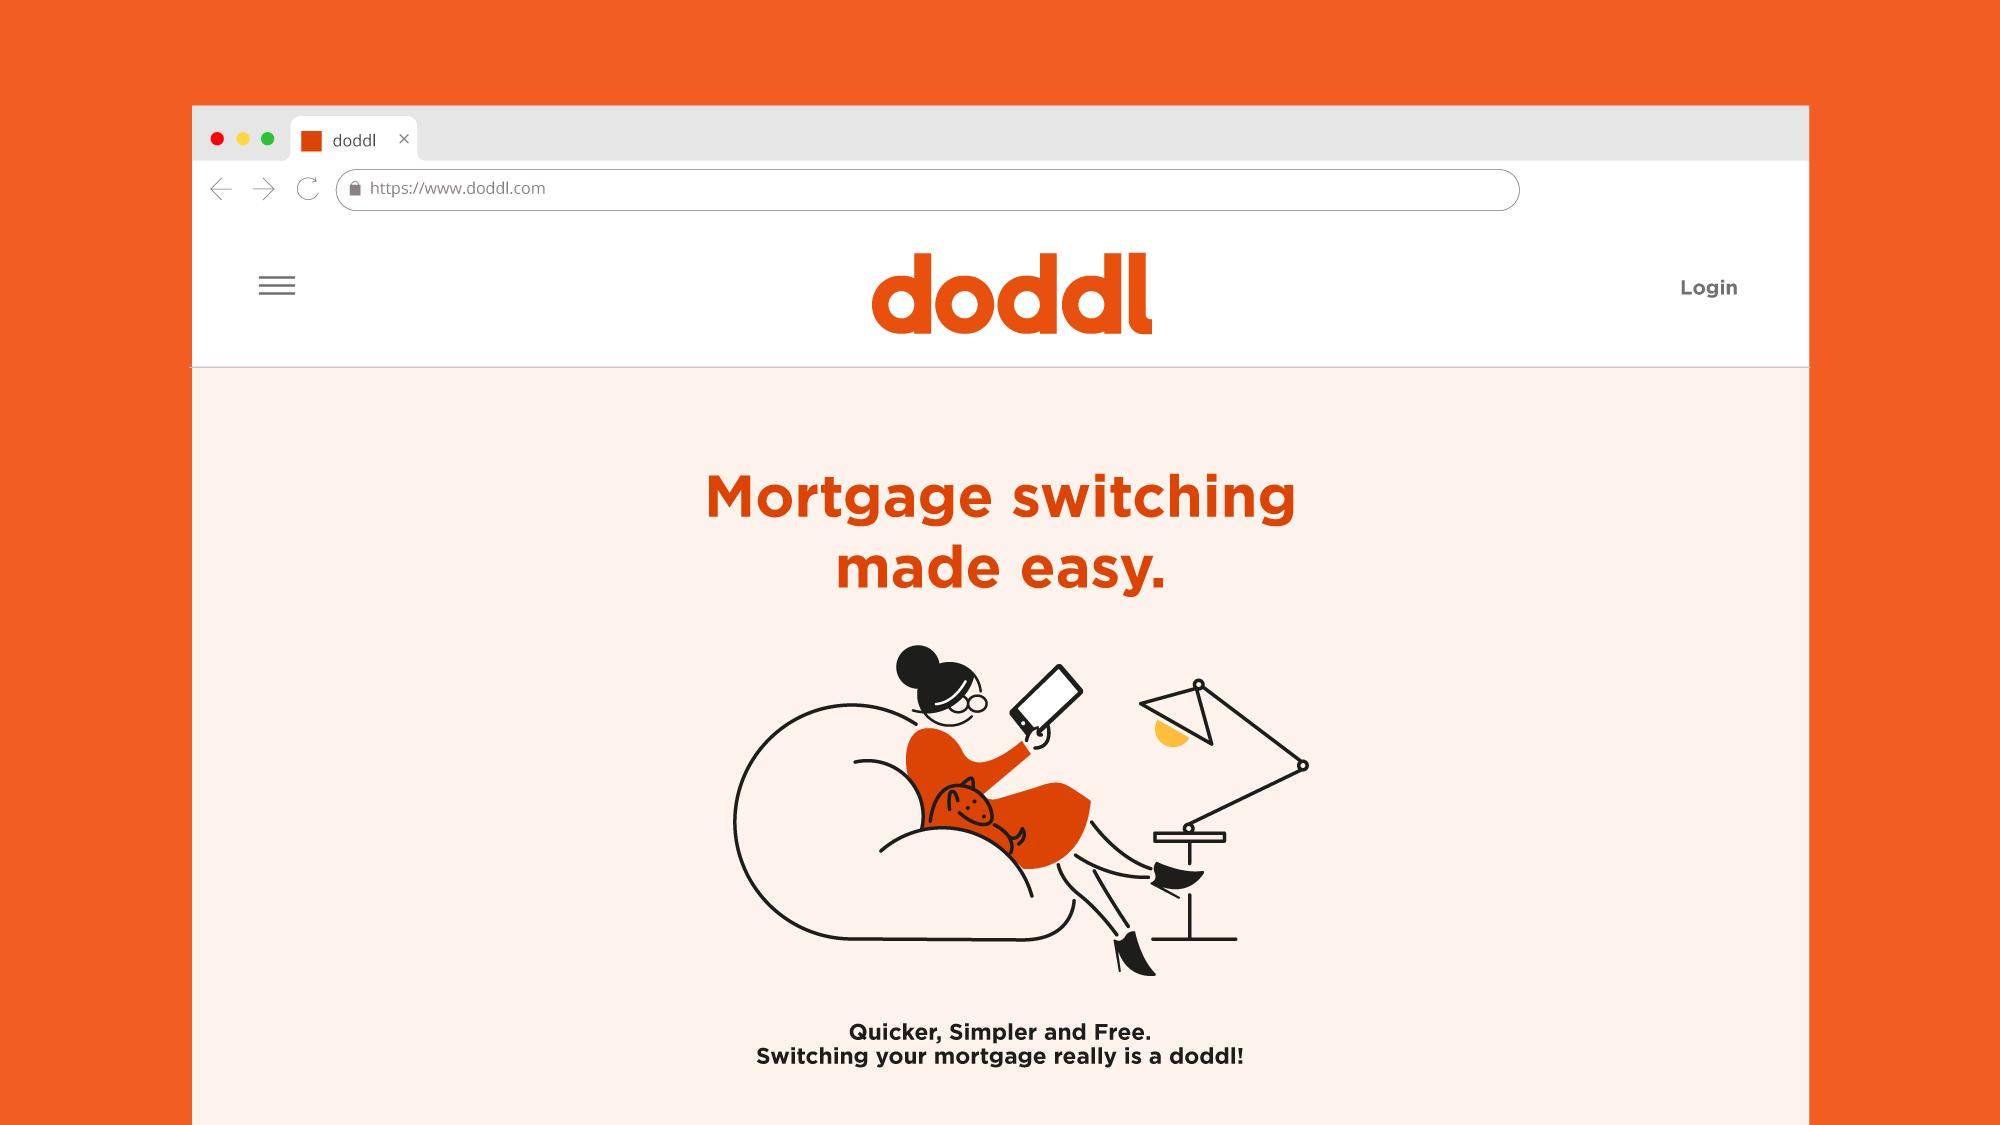 Cover image: doddl brand scheme